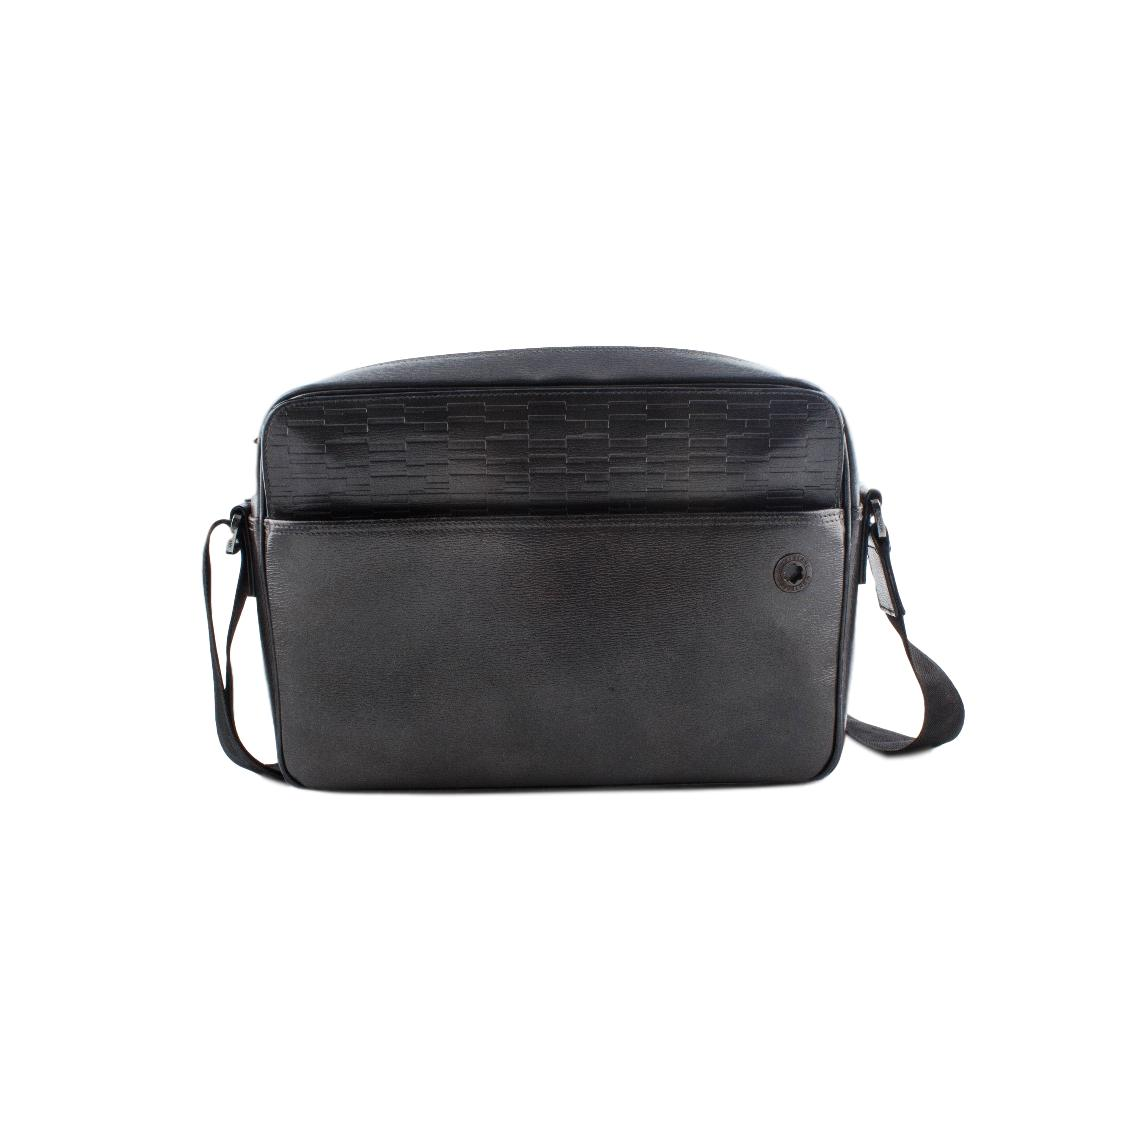 e9f26a7e33fd Купить сумку через плечо MONT BLANC за 6880 руб. в интернет магазине ...